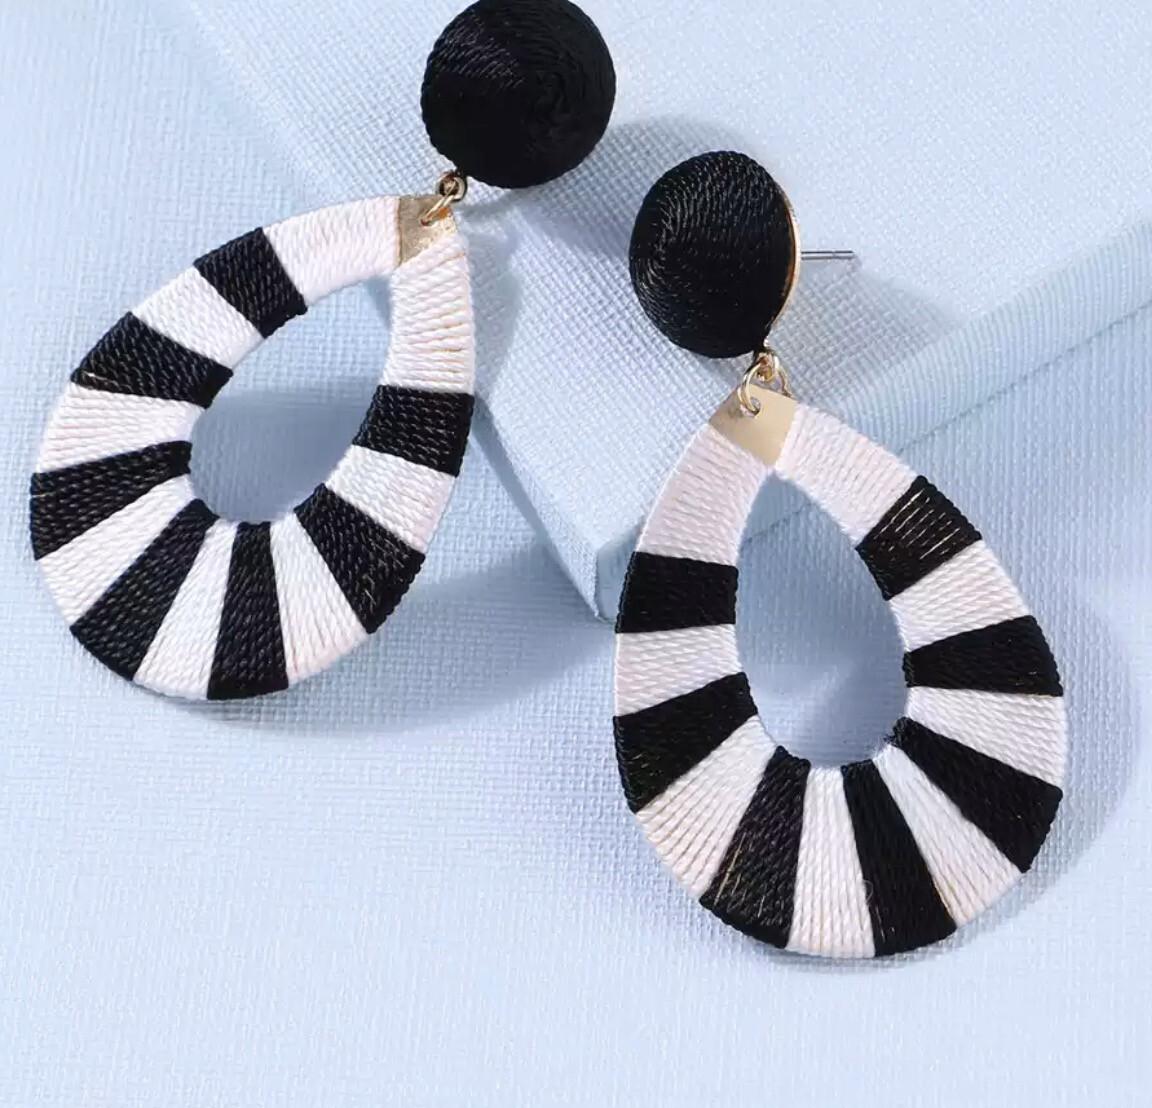 Zanti Earrings